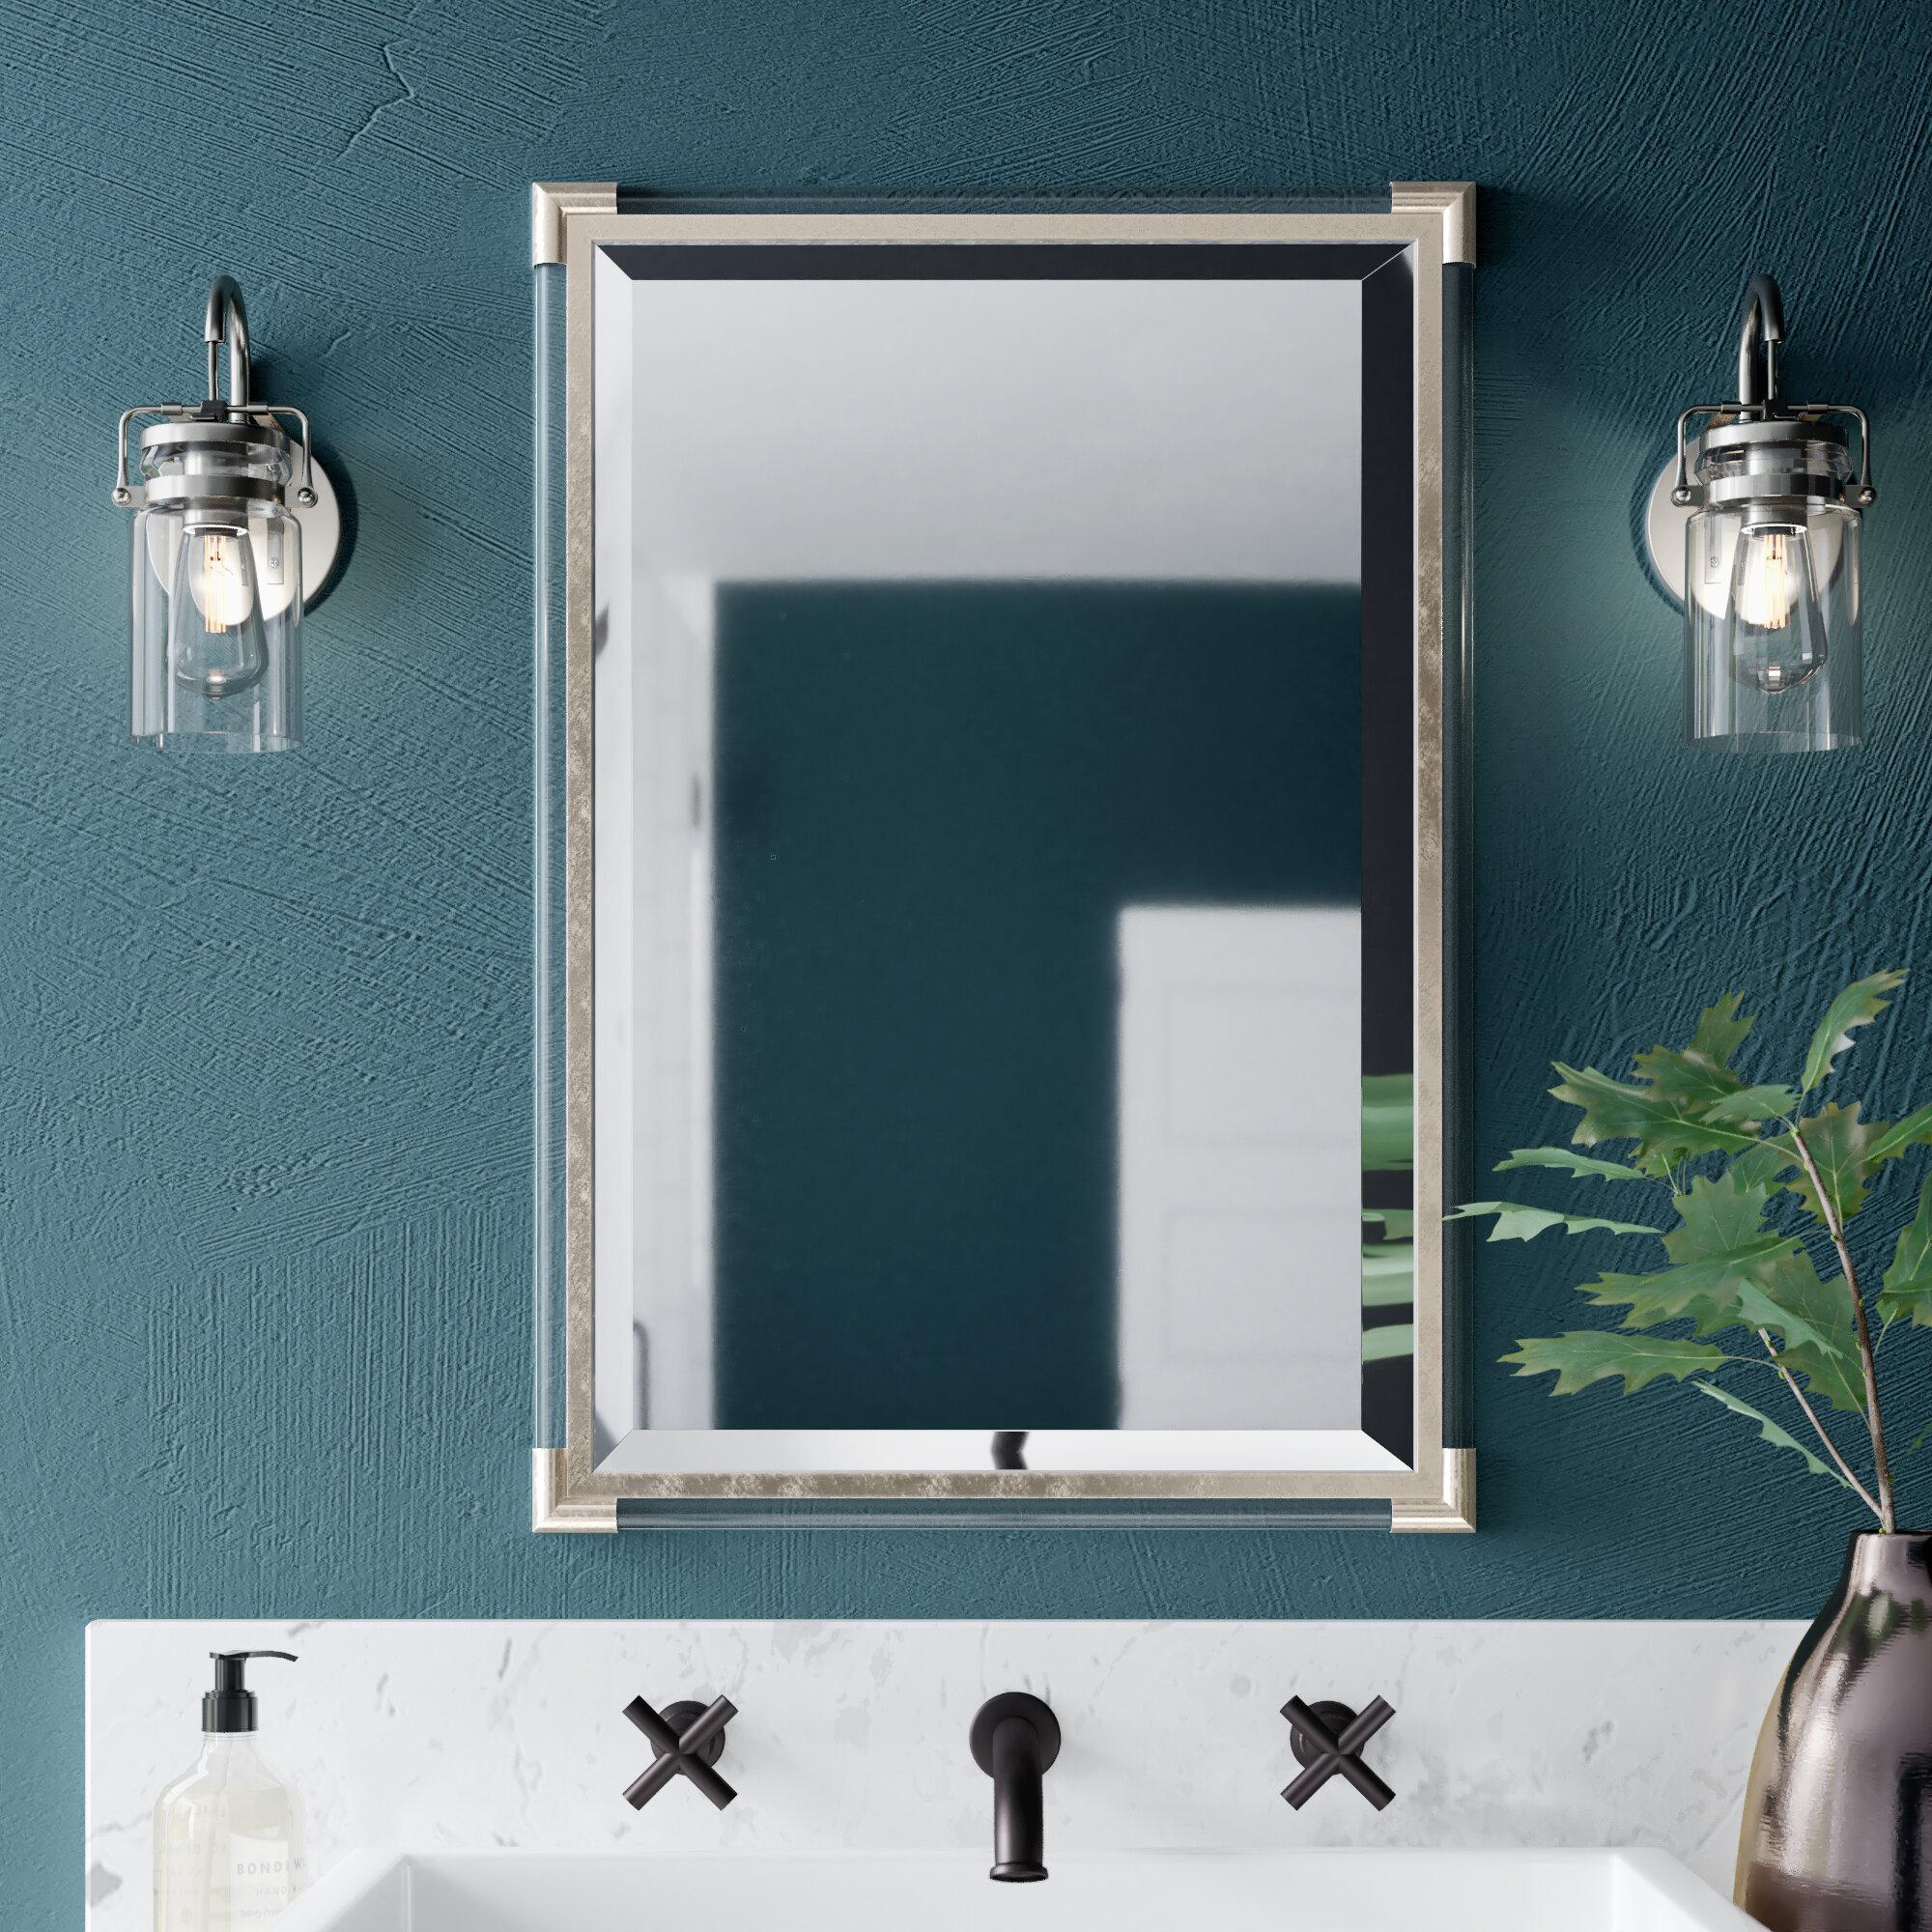 Broadmeadow Accent Wall Mirror | Wayfair Regarding Reba Accent Wall Mirrors (View 19 of 20)